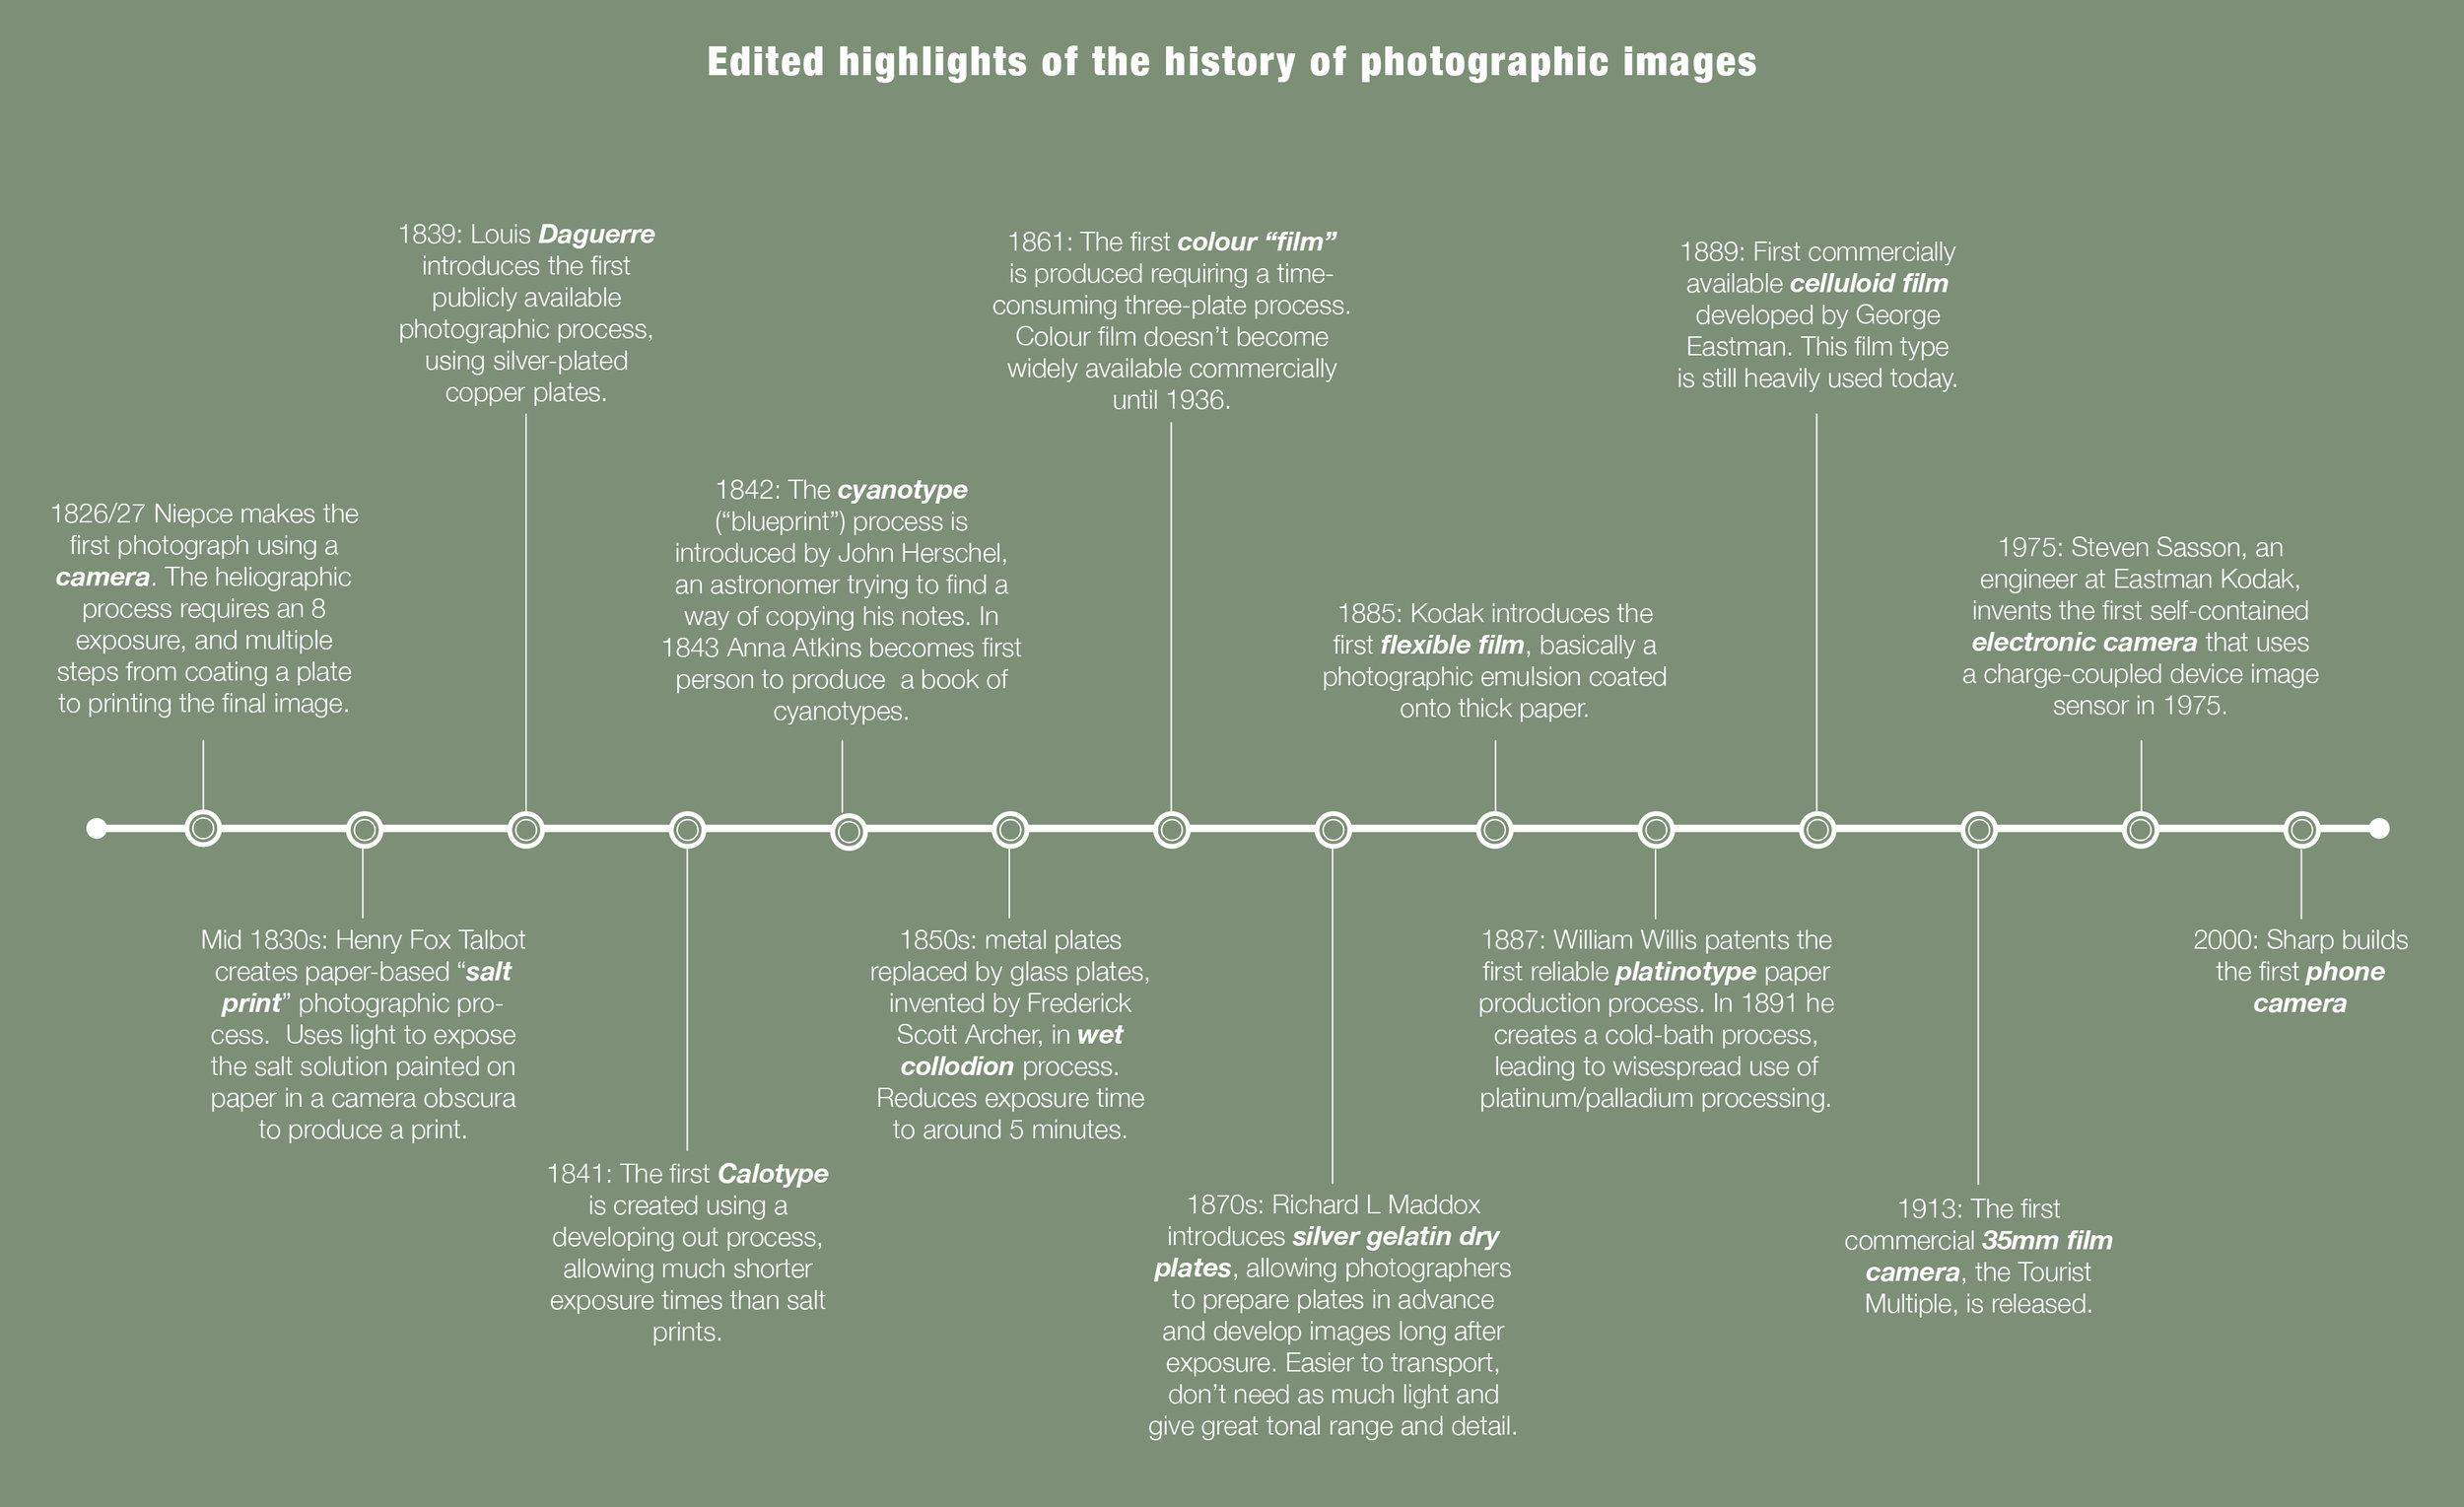 HistoryOfAnaloguePhotographyInfographic.jpg